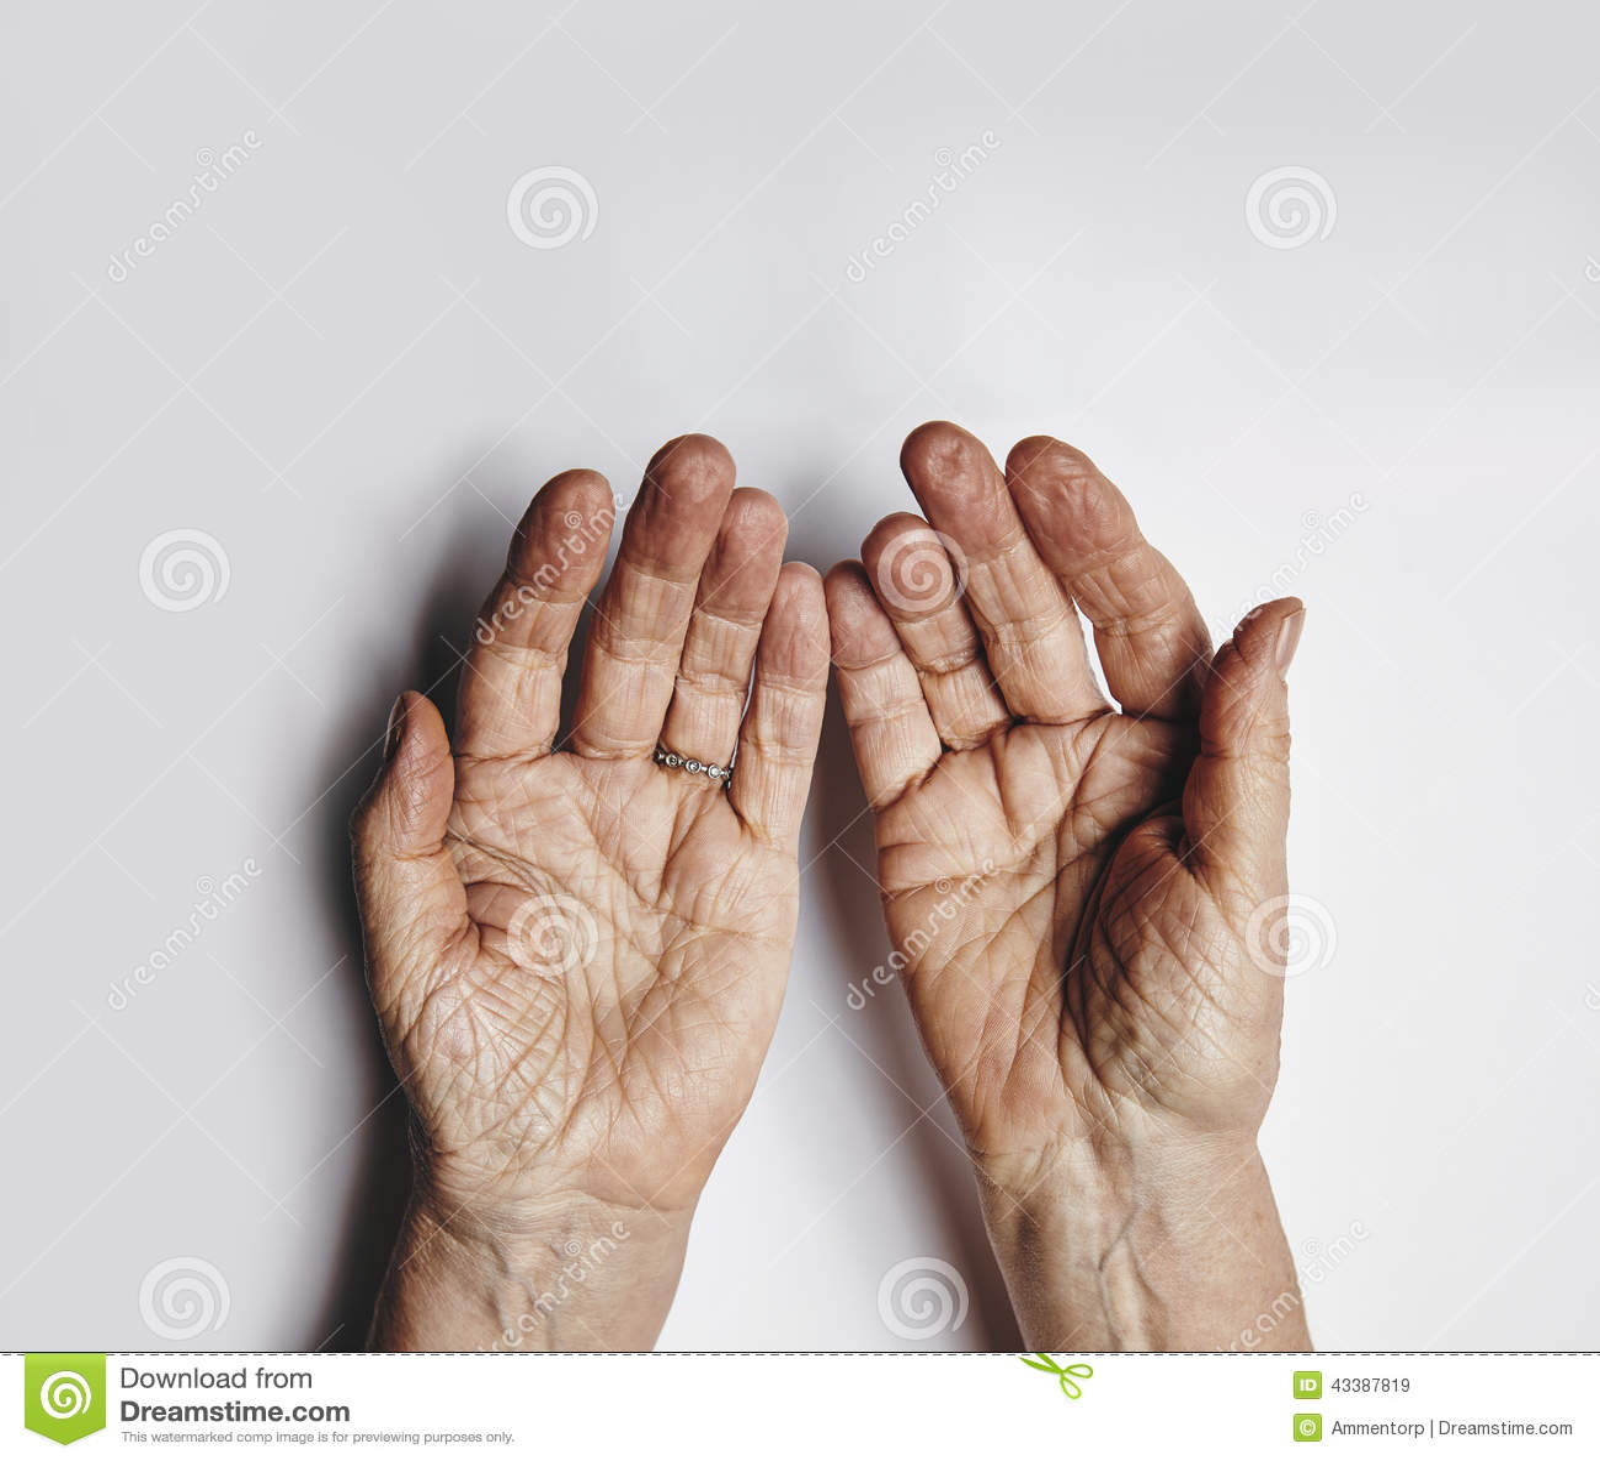 Elder care business plan